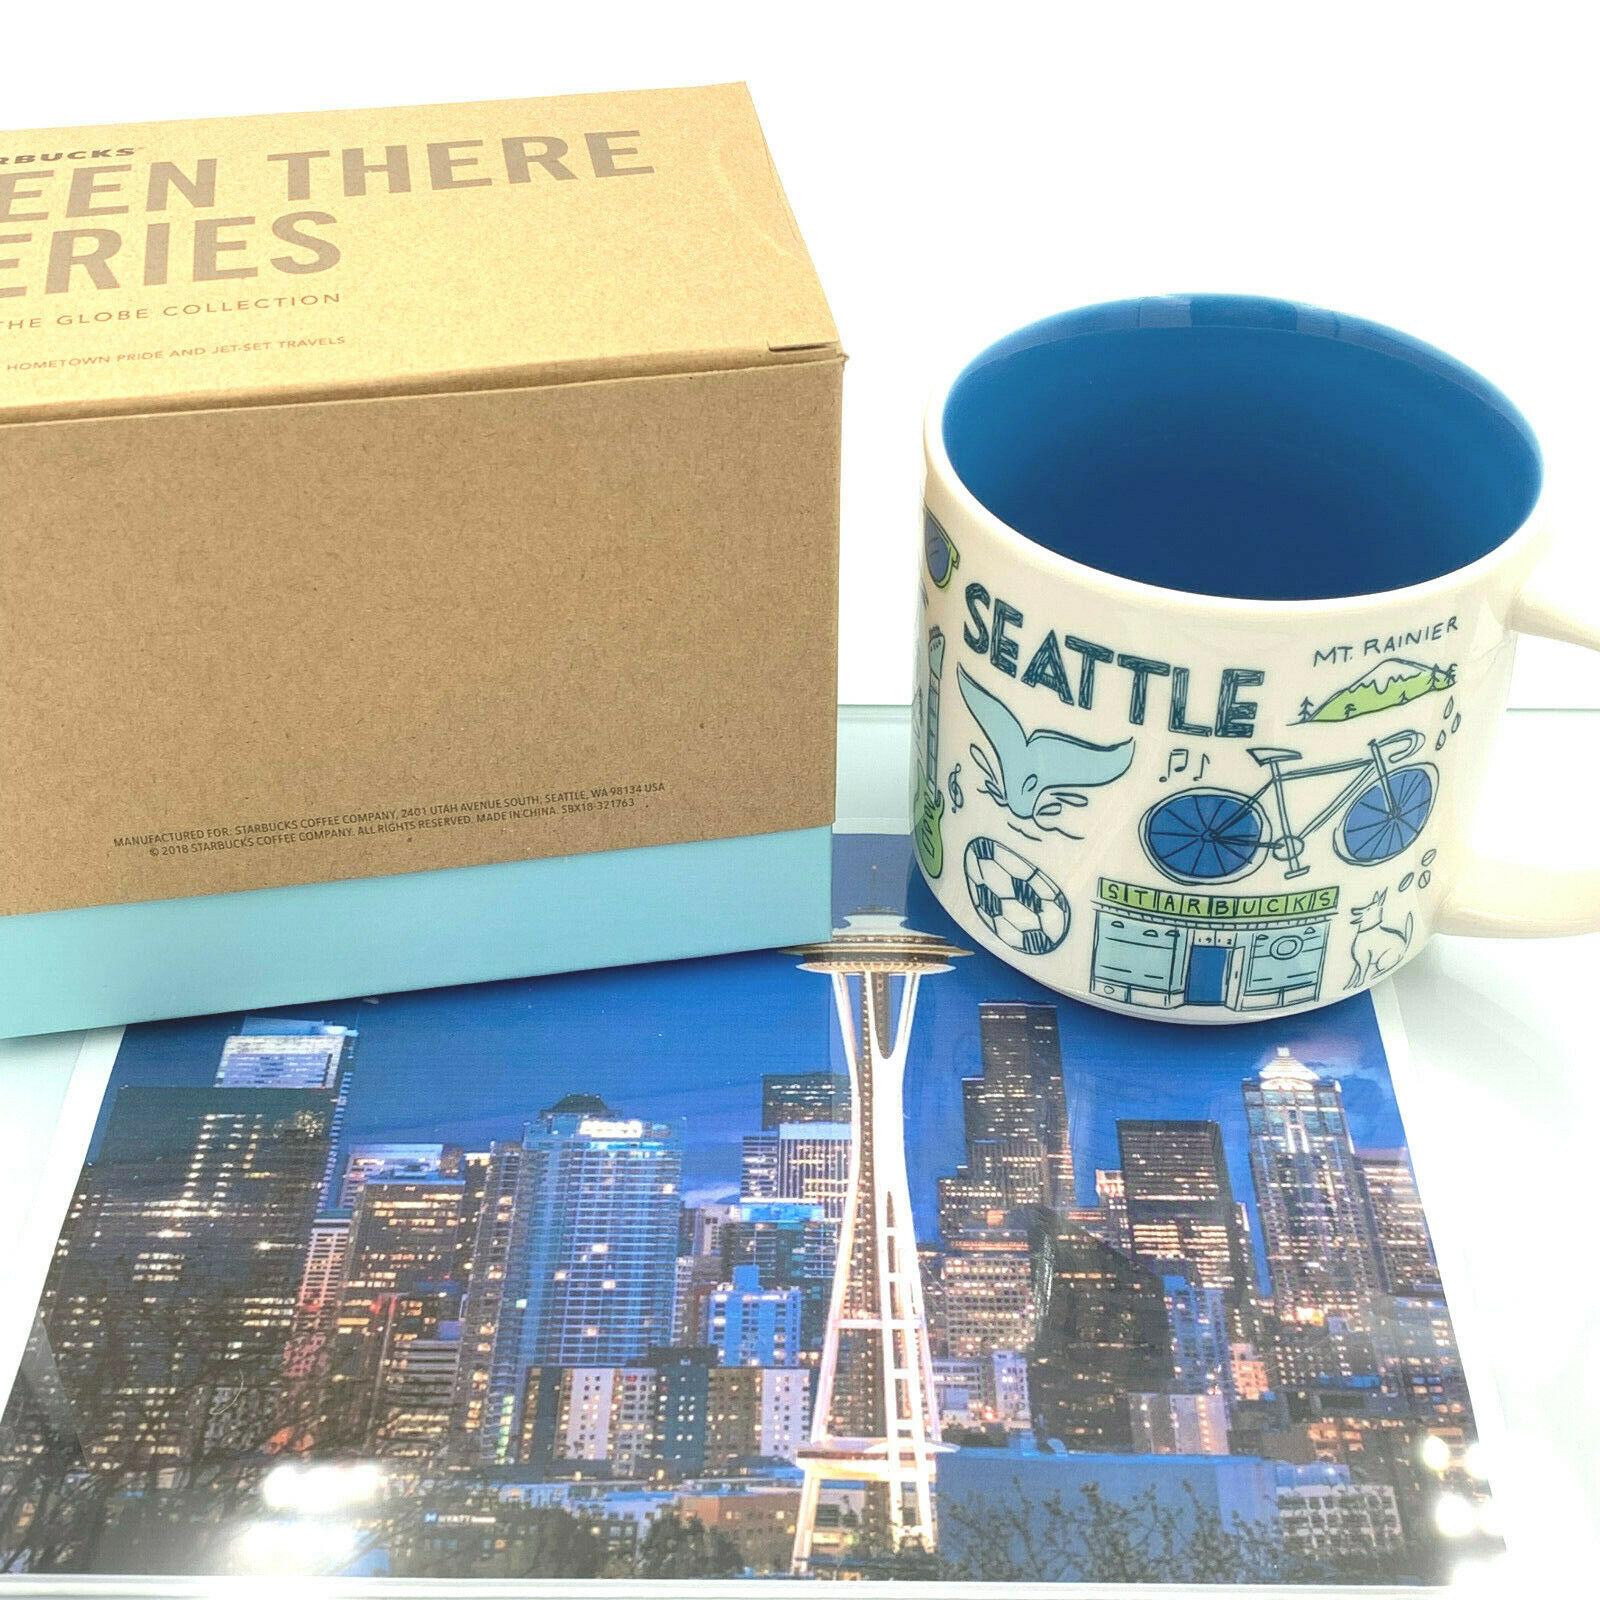 Starbucks Coffee Ceramic Mug Cup USA World Collection Coffee Tea Hot 14 oz Gift